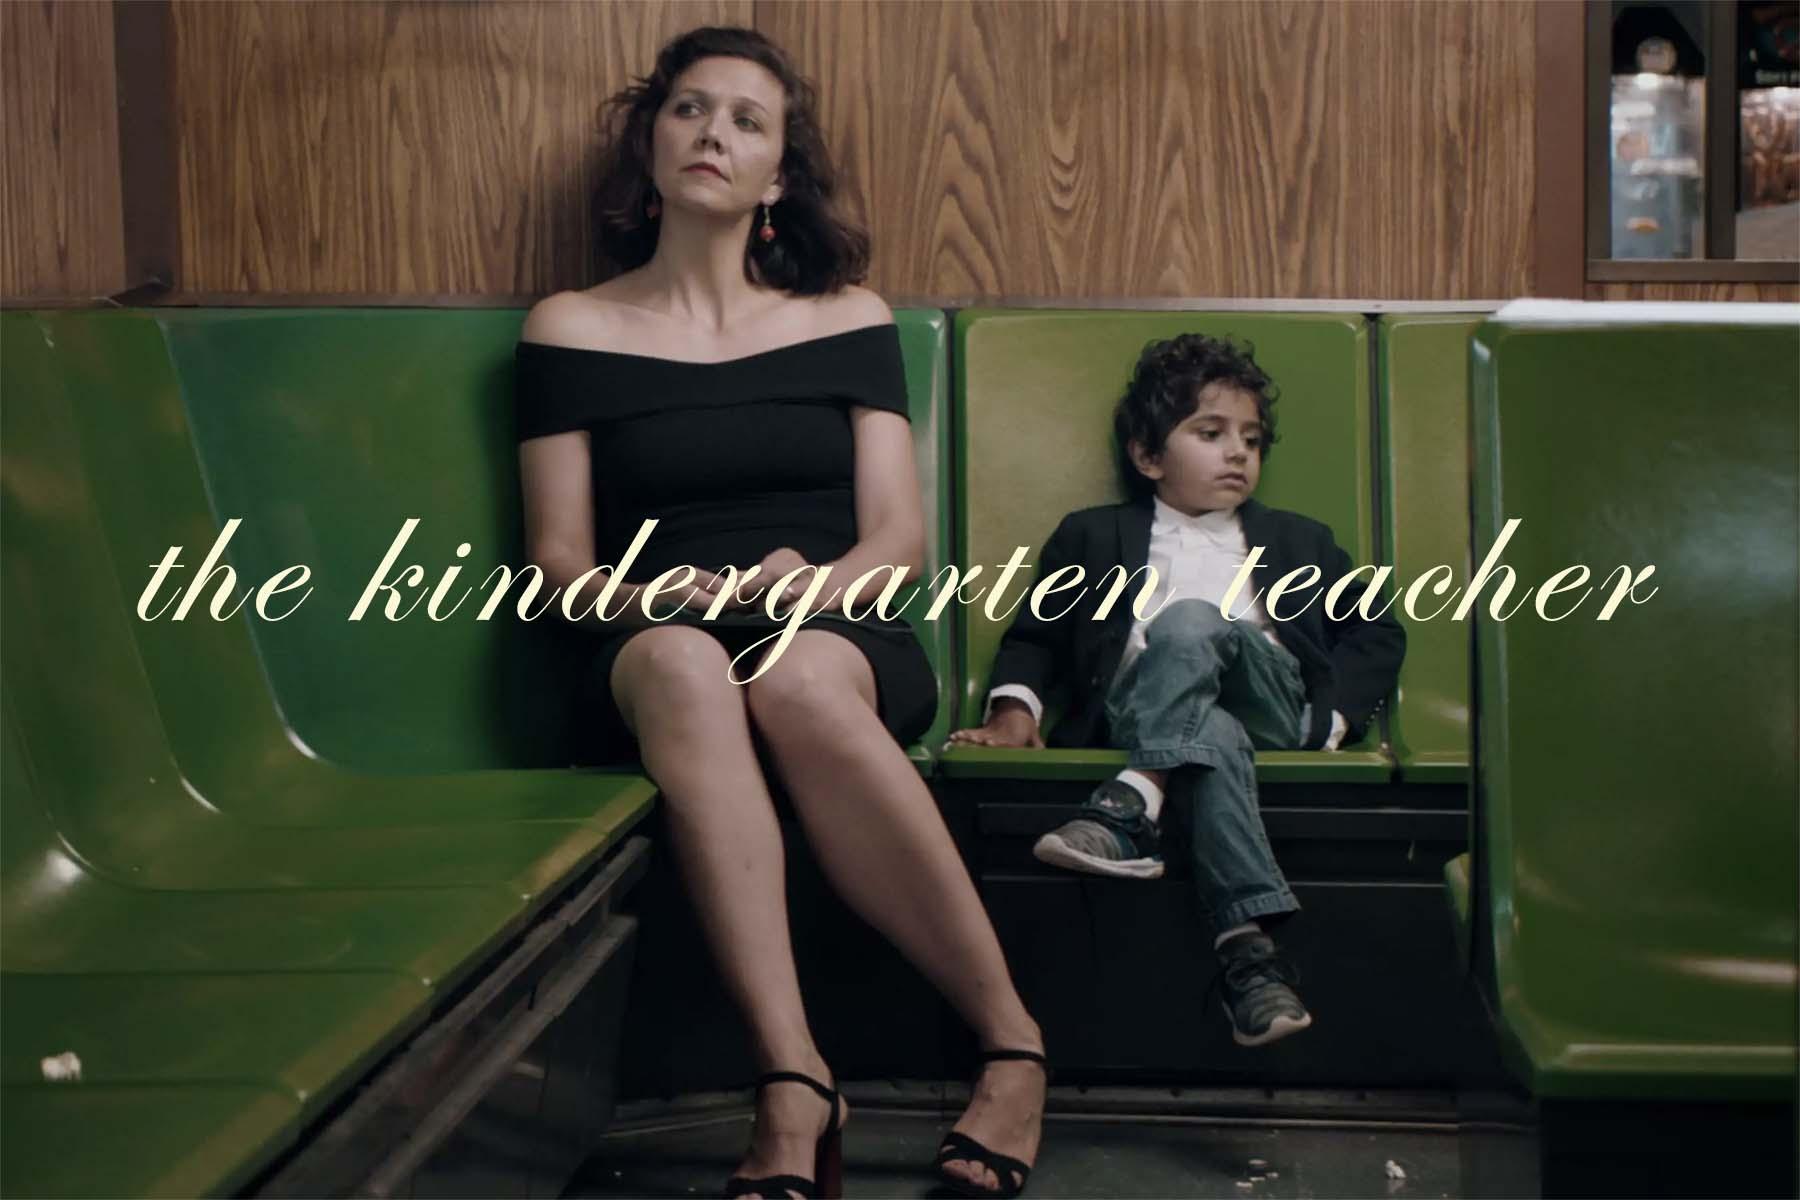 the kindergarten teacher movie explained - Kindergarten Teacher Movie